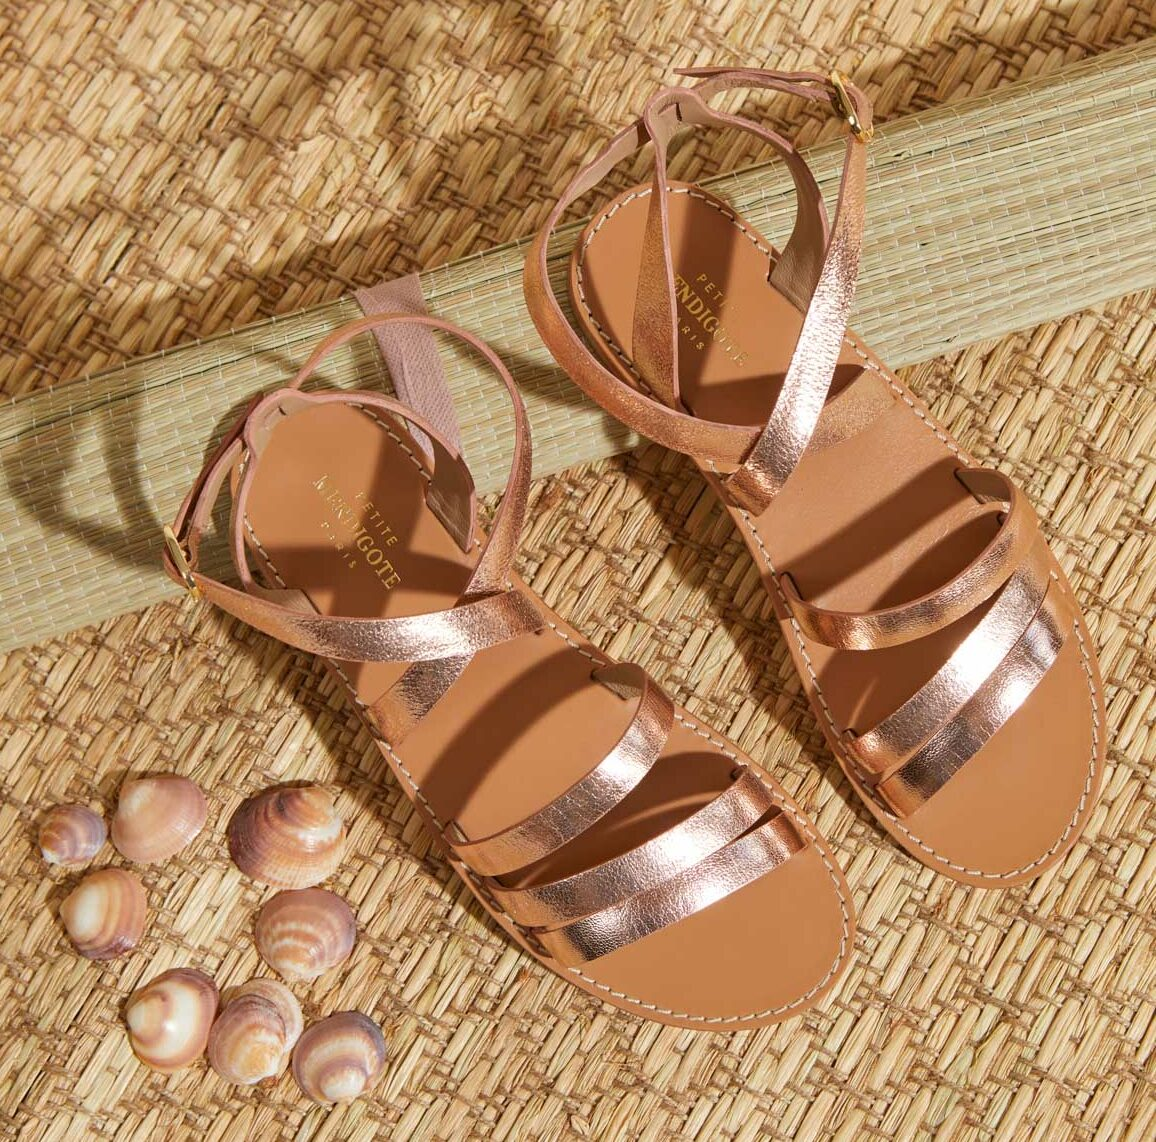 Sandales floriano, collection Plein Soleil, Petite Mendigote